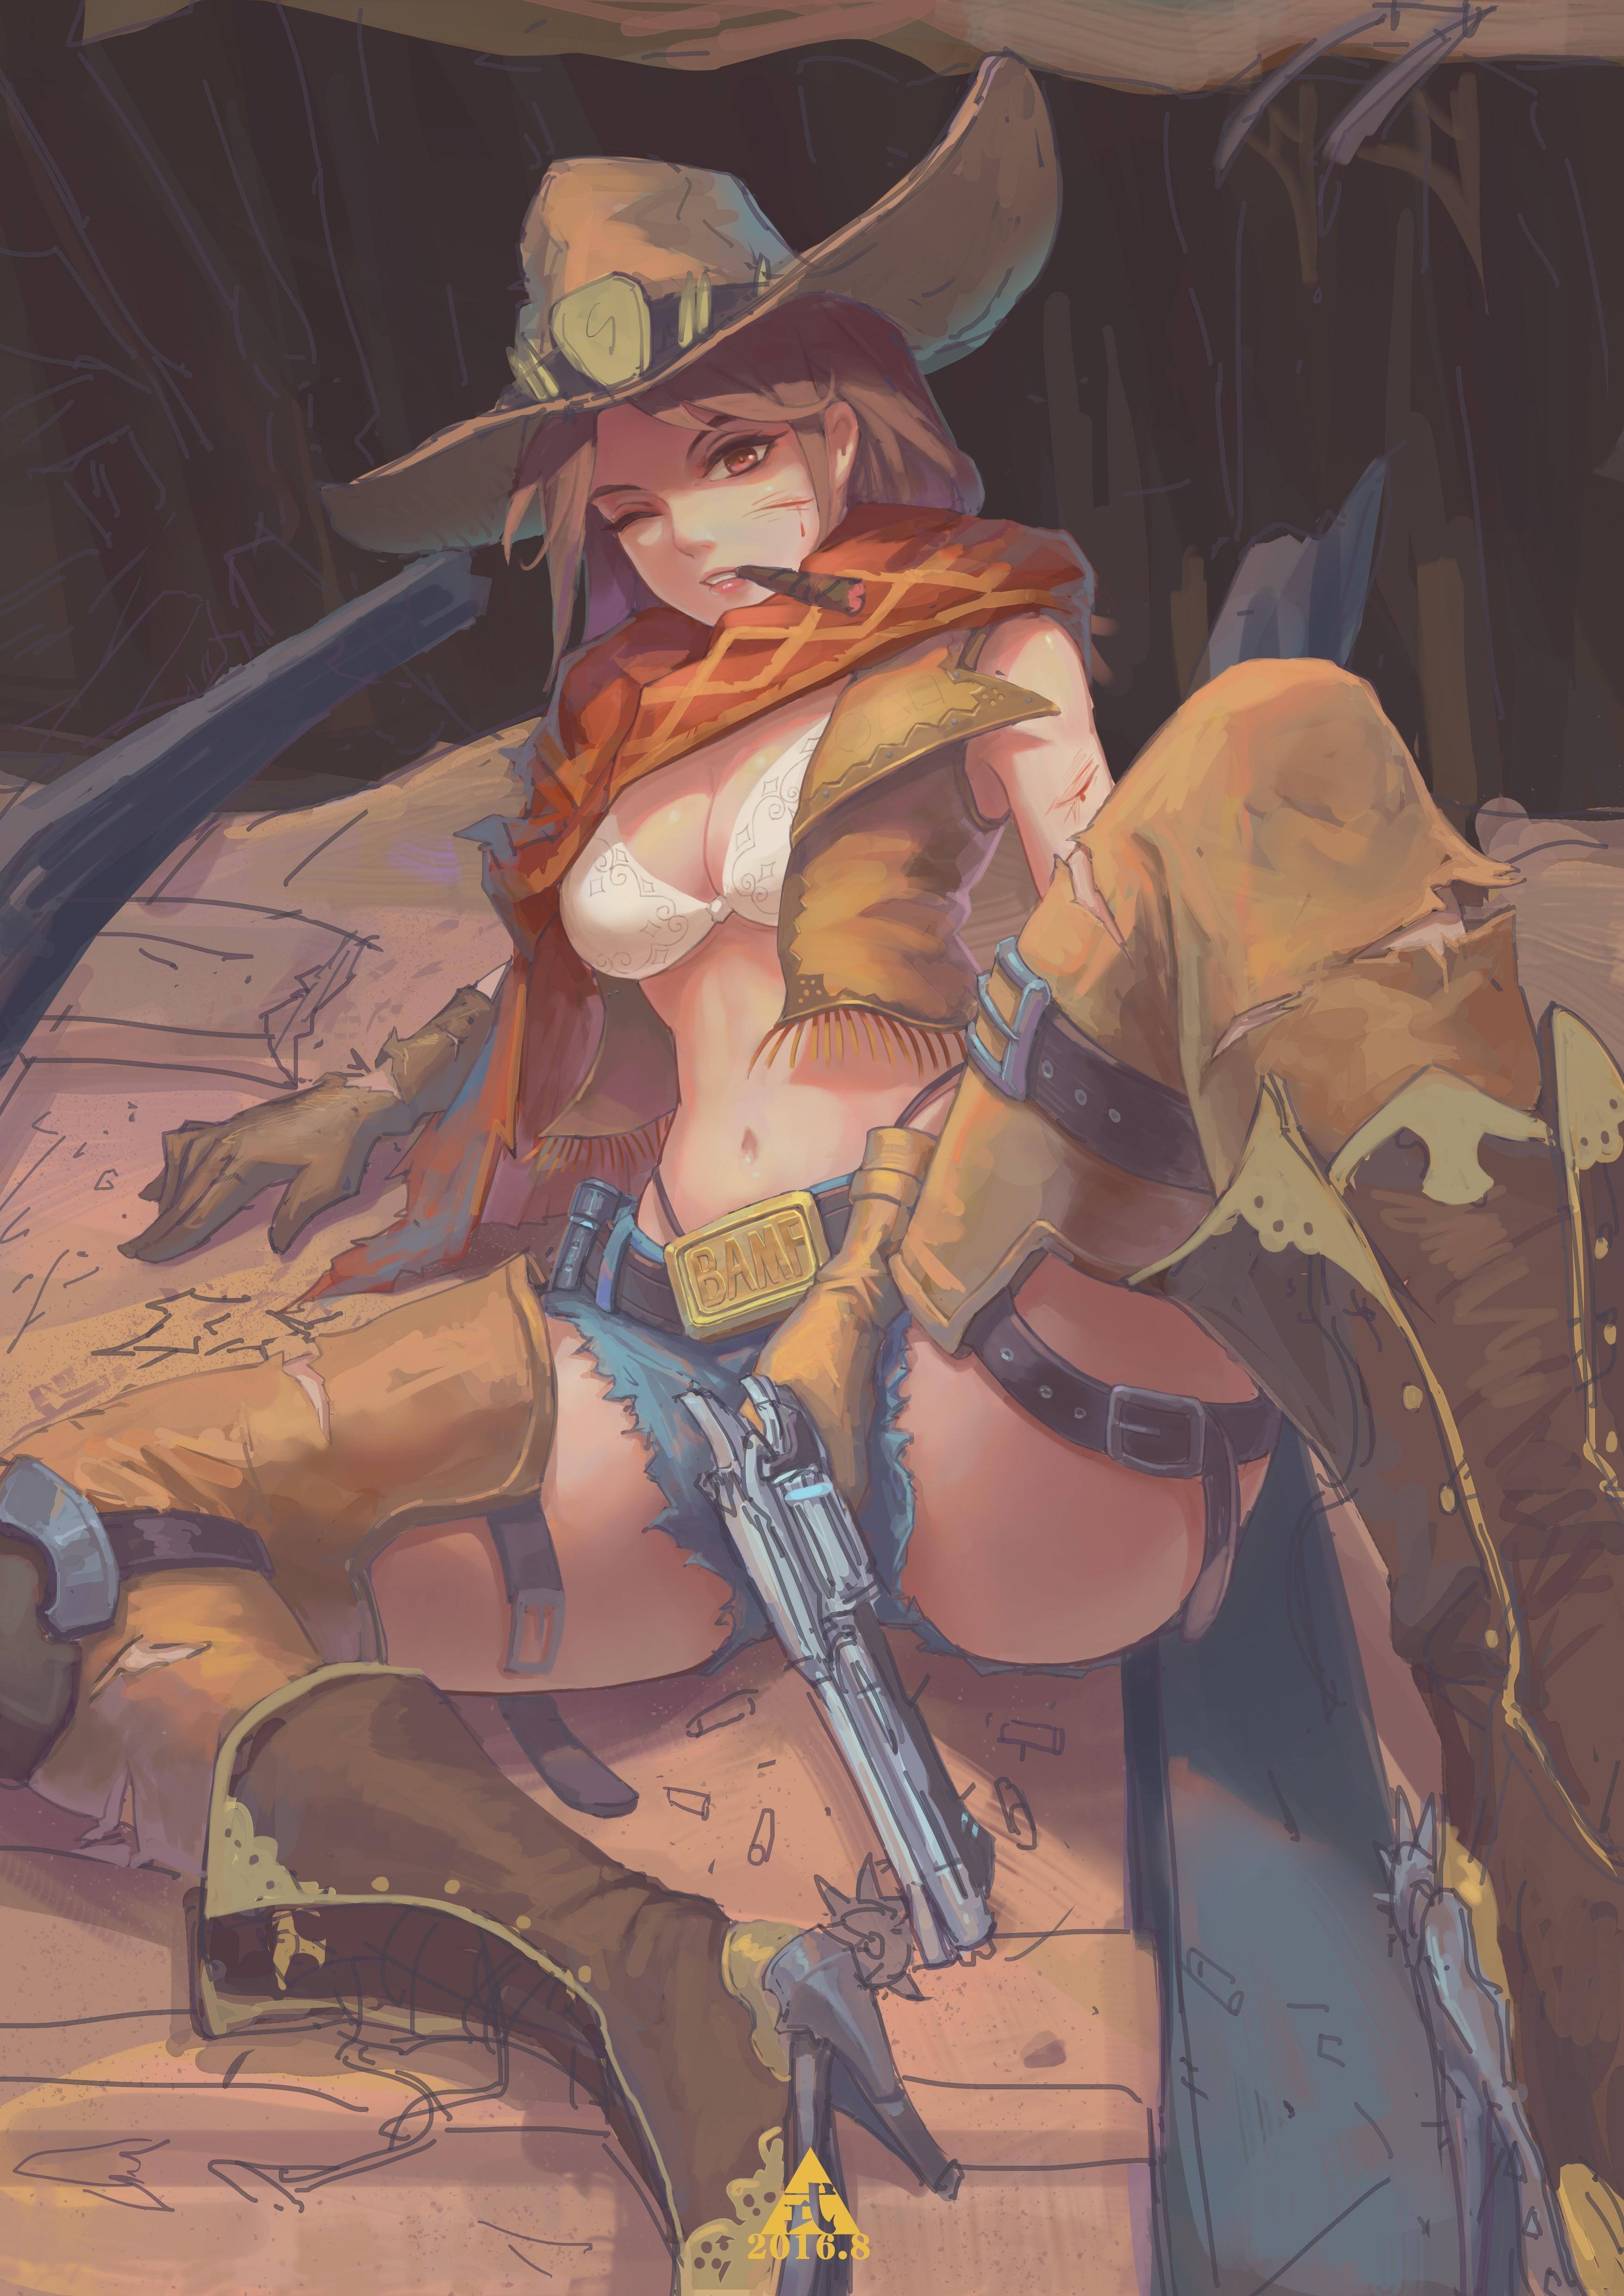 Persona Girls Wallpaper Fondos De Pantalla Dibujo Ilustraci 243 N Pistola Anime